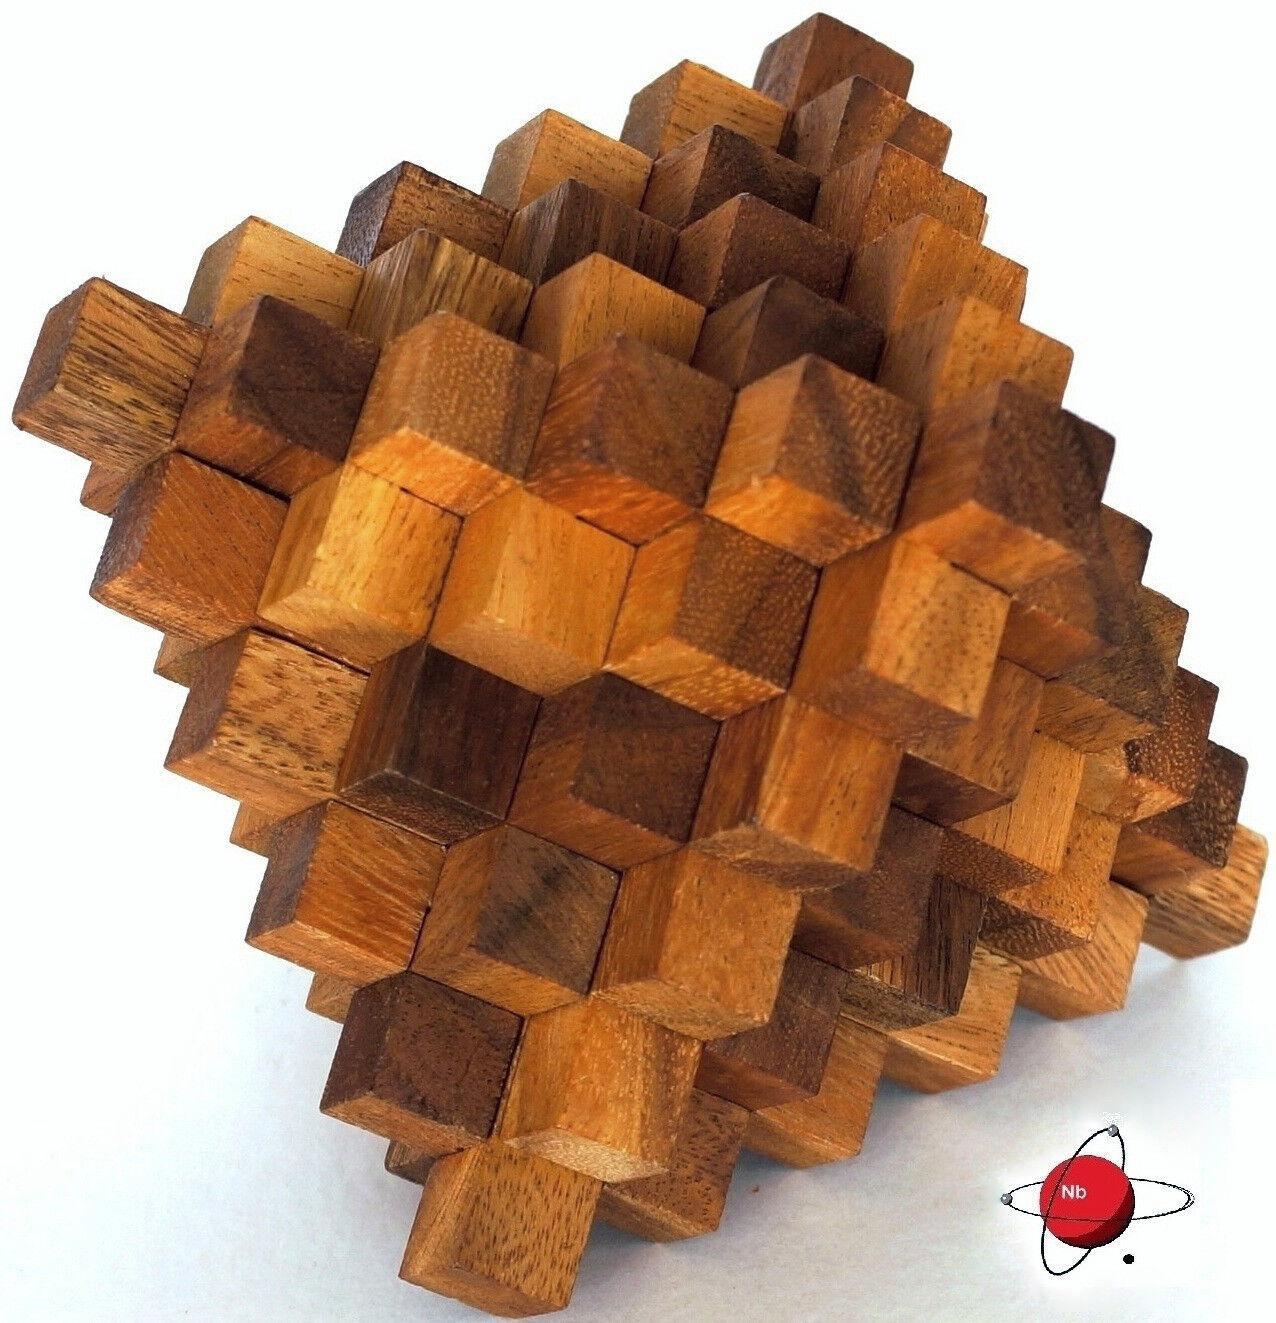 RELATIVITY - Wood Puzzle Brain Teaser Death Star Pagoda Noggin Busters